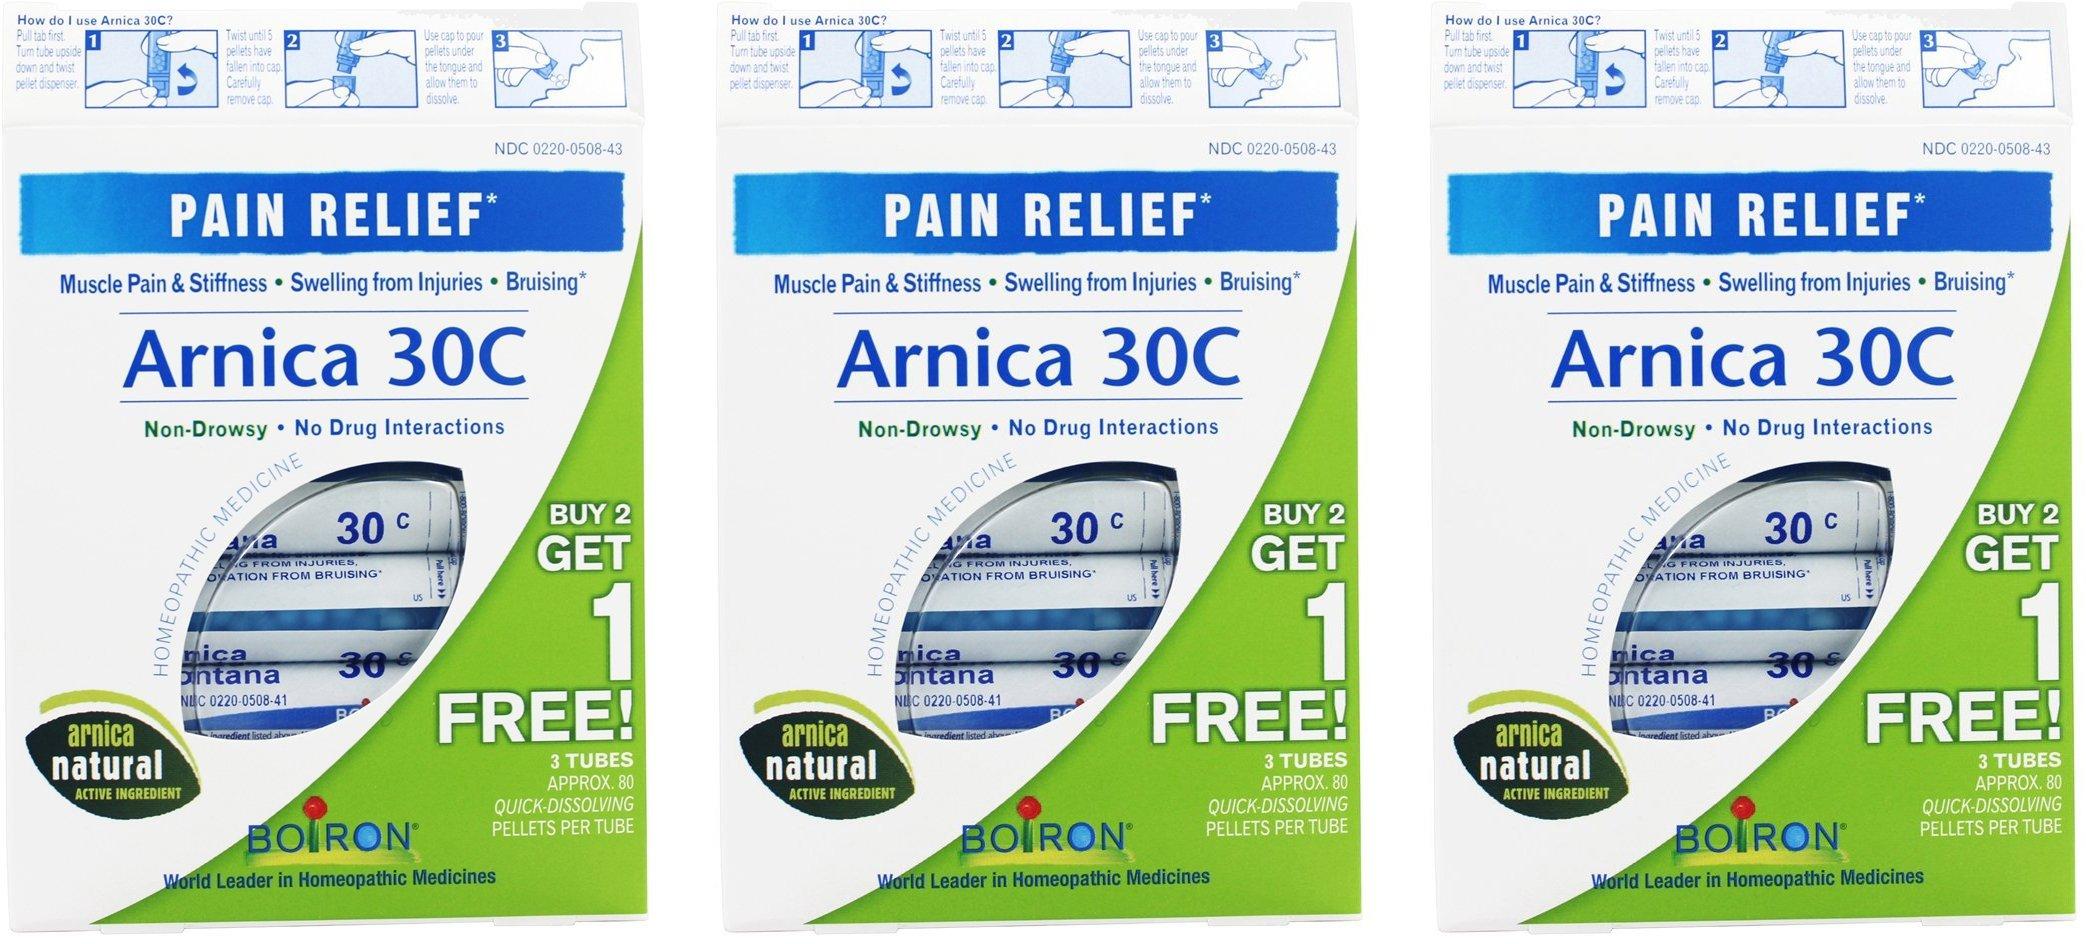 Boiron Arnica 30C Pellets (3 tubes per box) (Pack of 3)